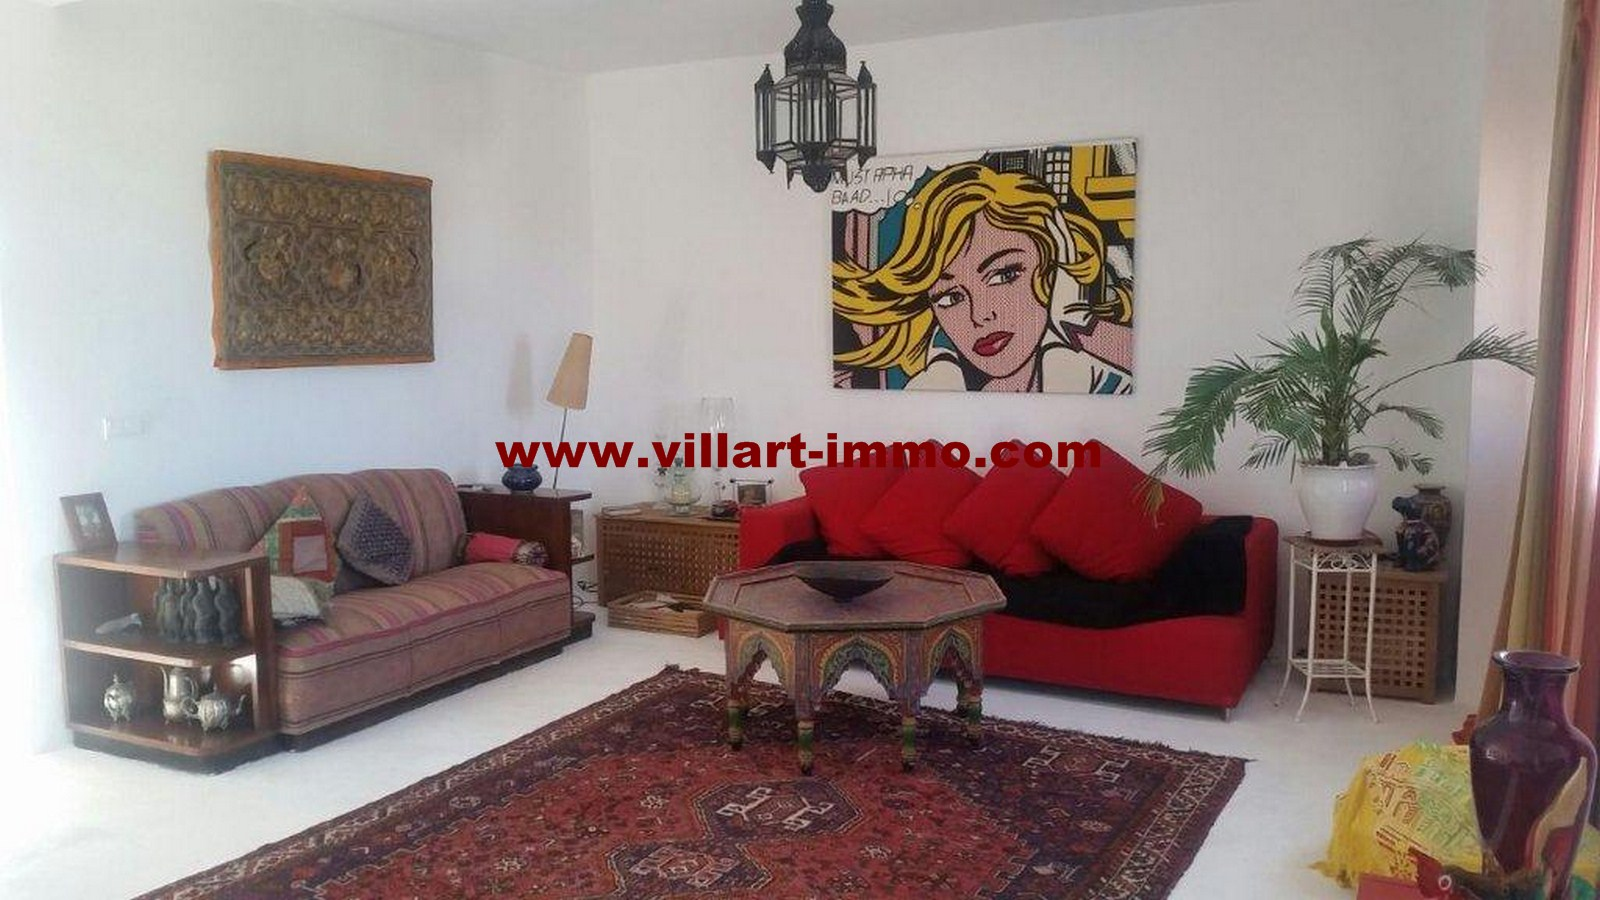 5-vente-villa-tanger-autres-salon-5-vv454-villart-immo